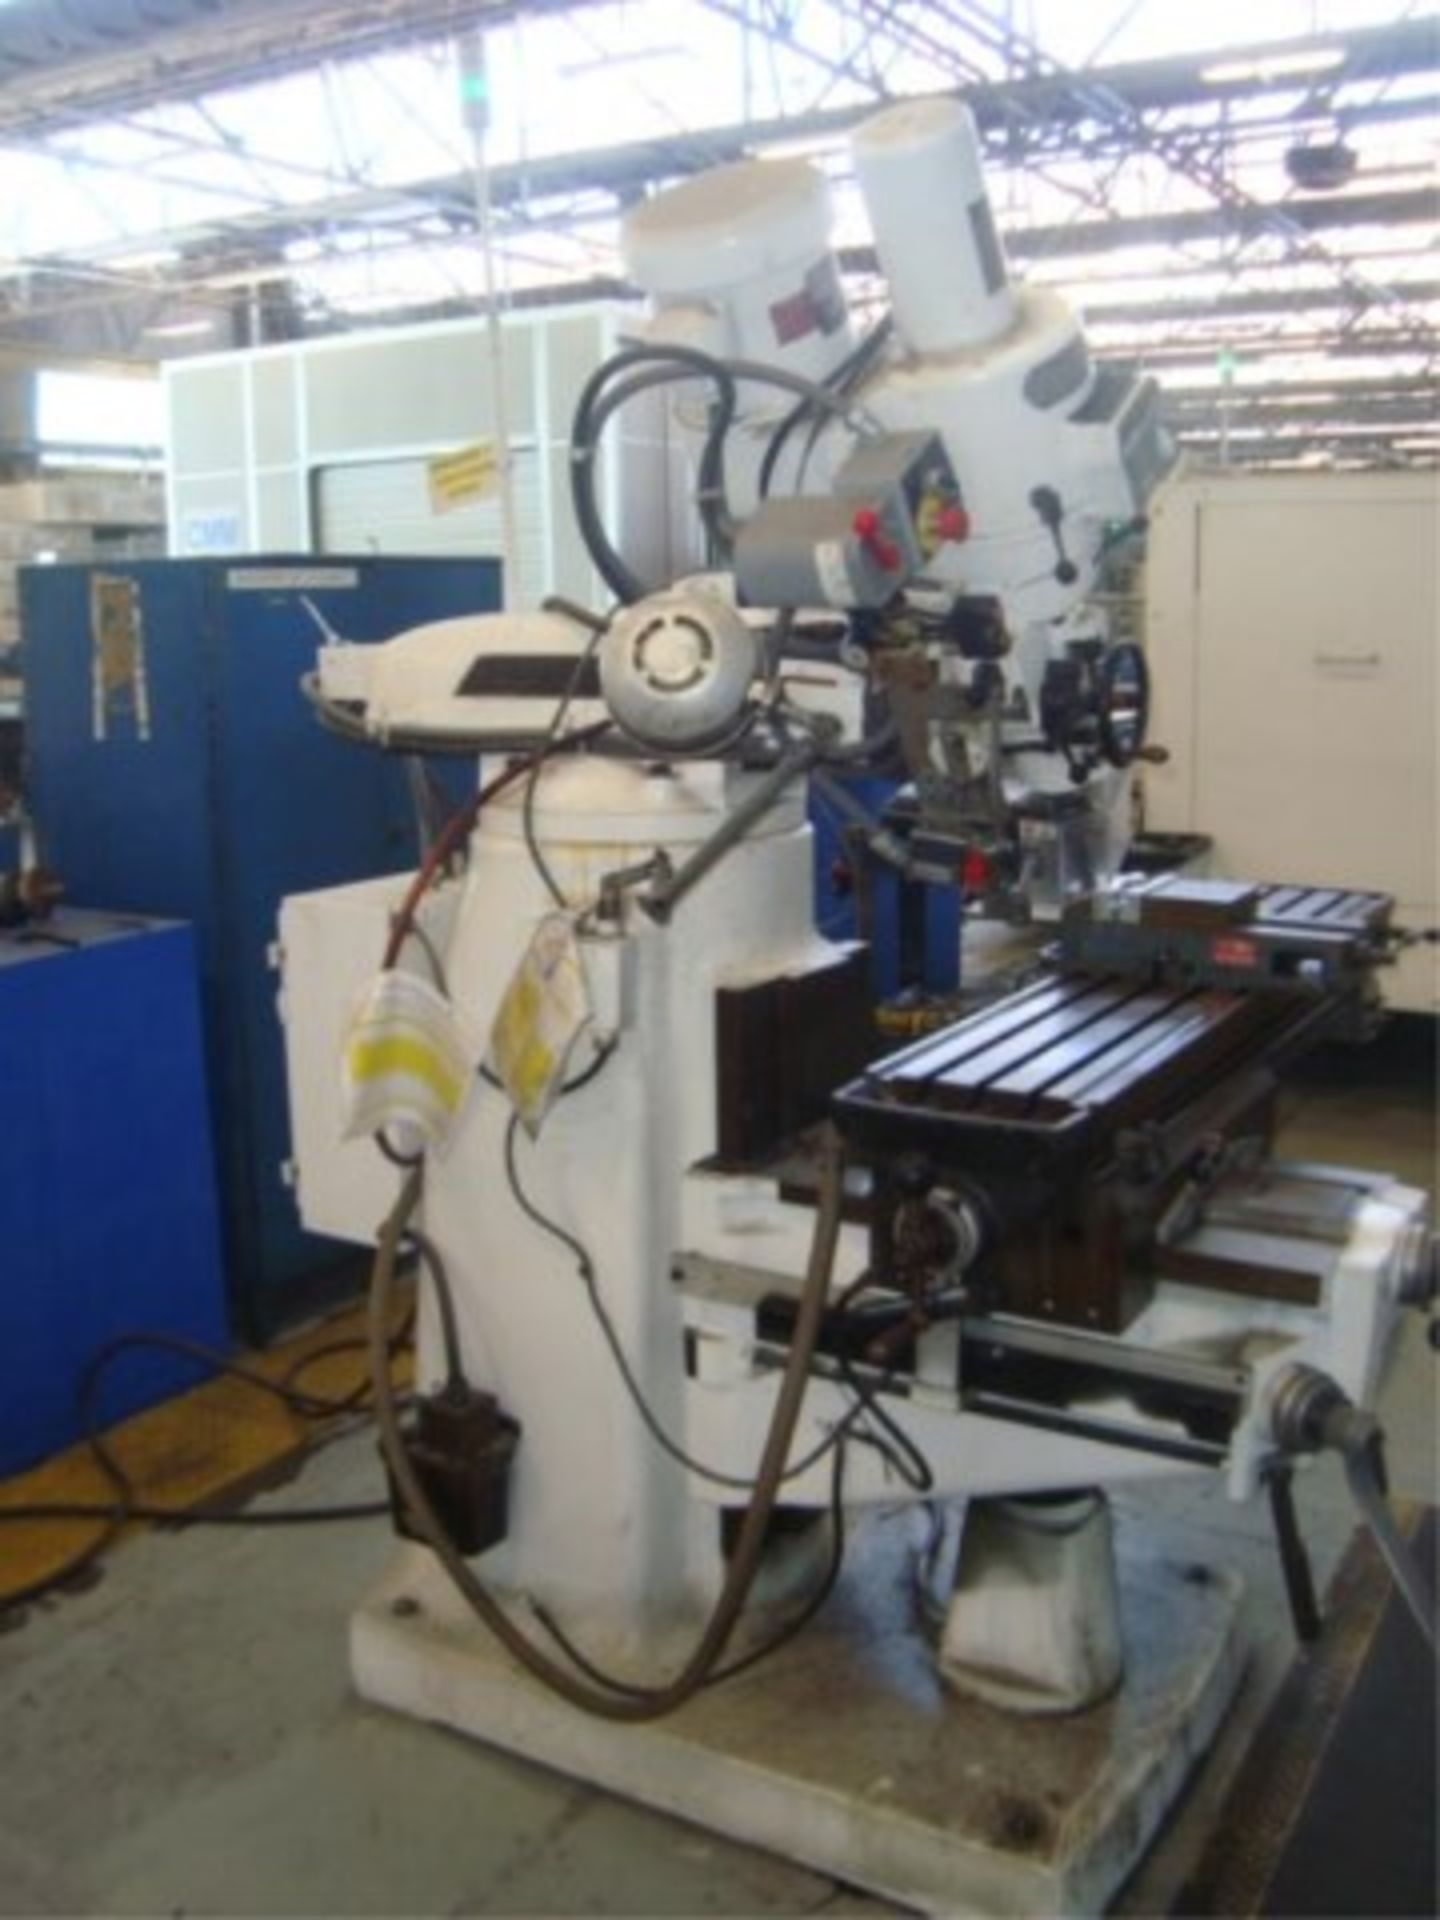 Lot 143 - Vertical Milling Machine